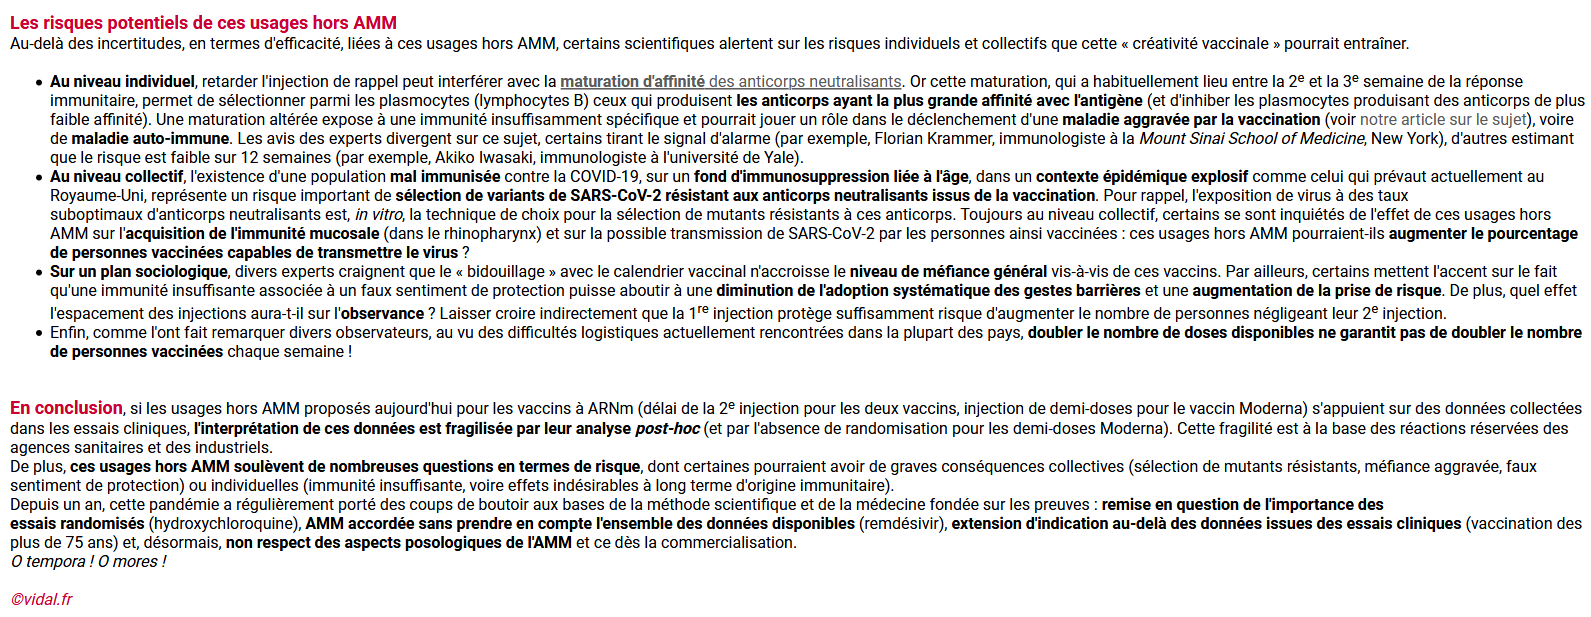 Screenshot_2021-01-08 لقاحات COVID19 رياح الإبداع في جدول اللقاحات. png